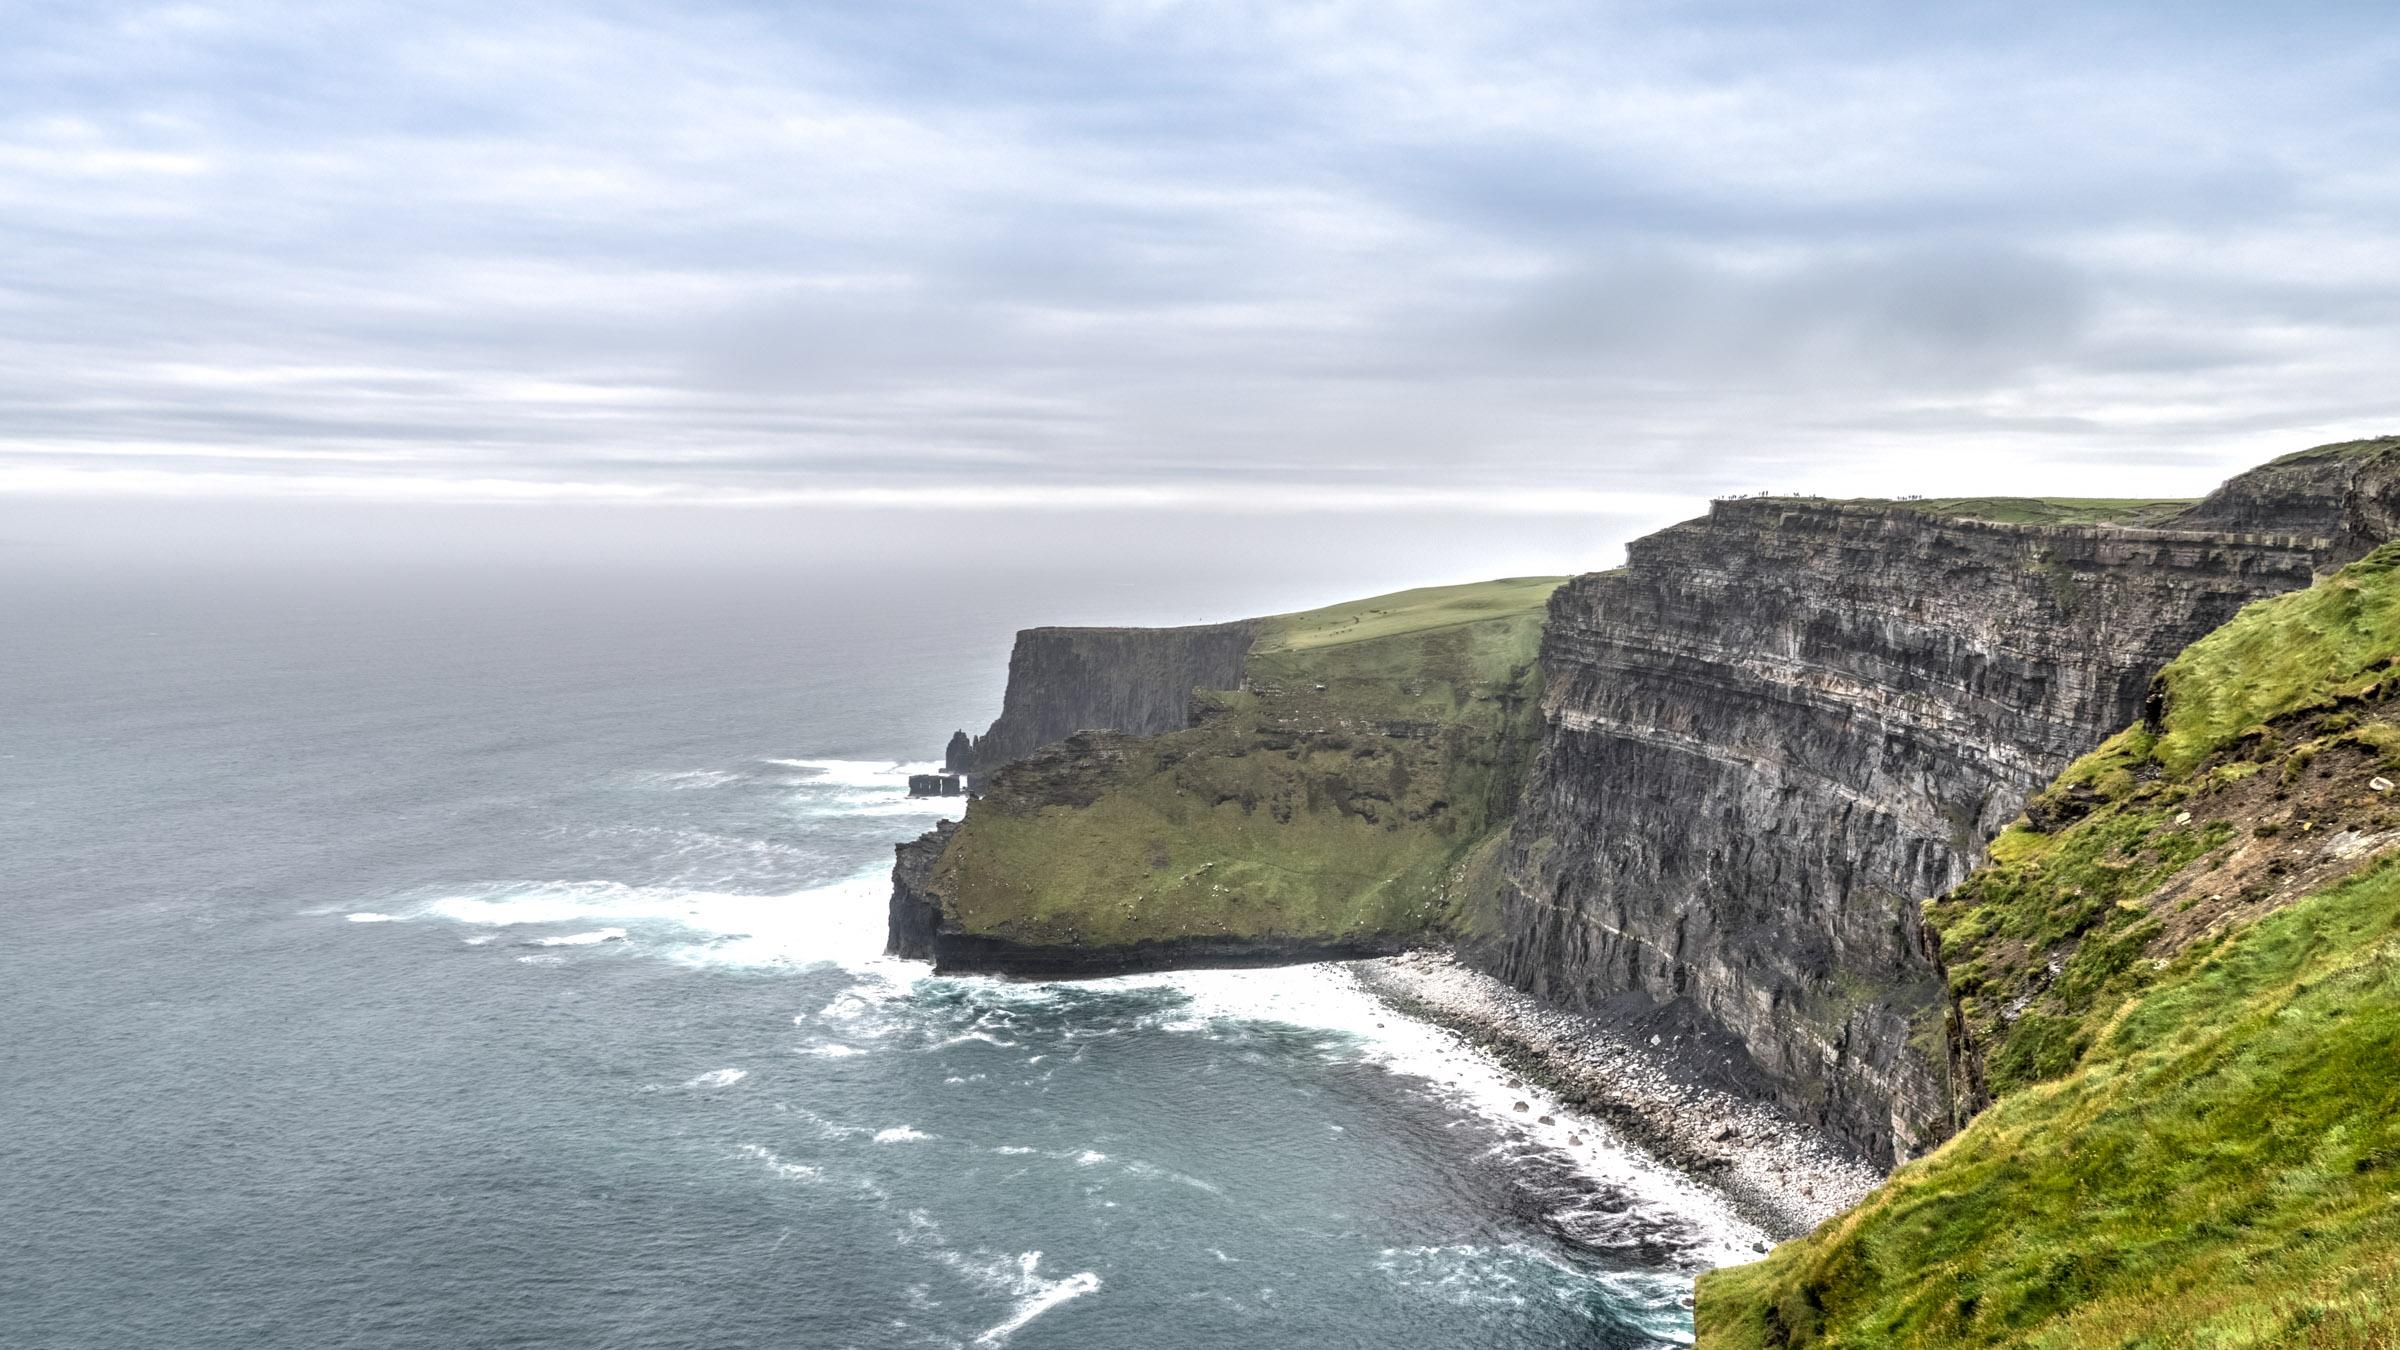 Ireland-3496-HDR-EditAnd2more_Optimizer-2